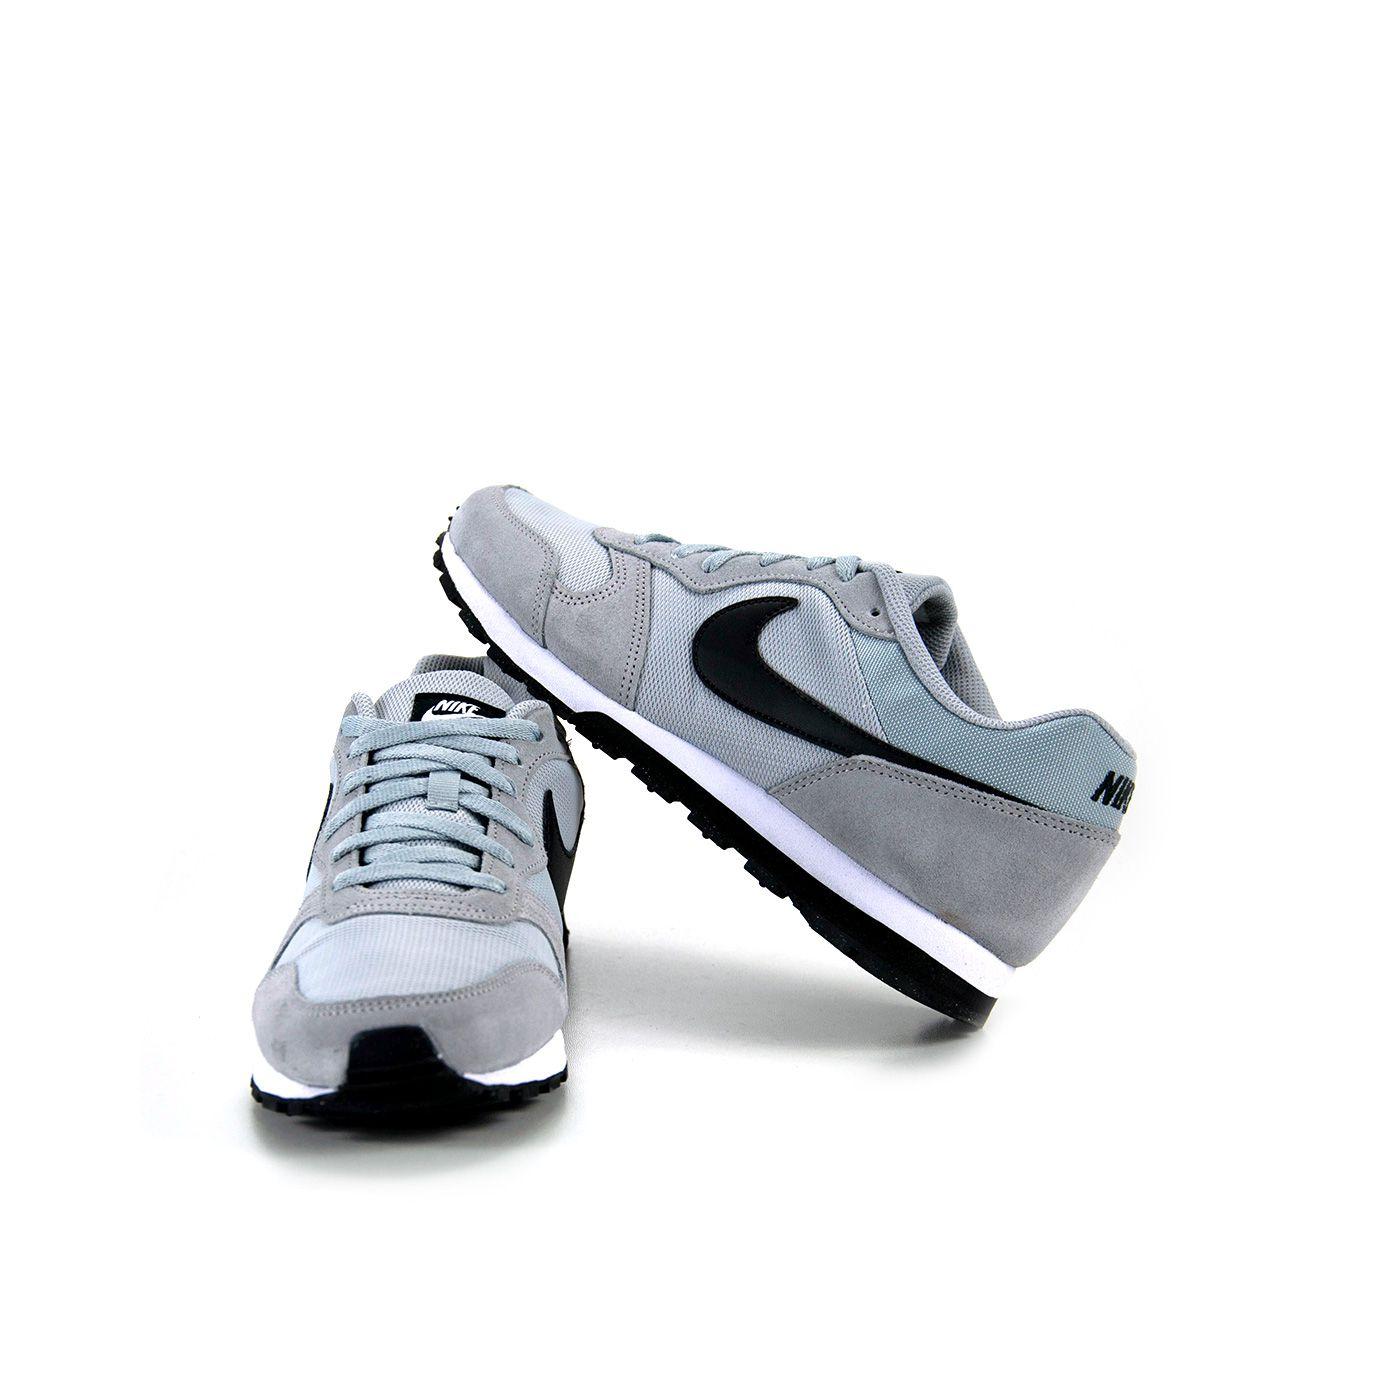 Tênis Nike MD Runner 2 CINZA PRETO - 749794-001